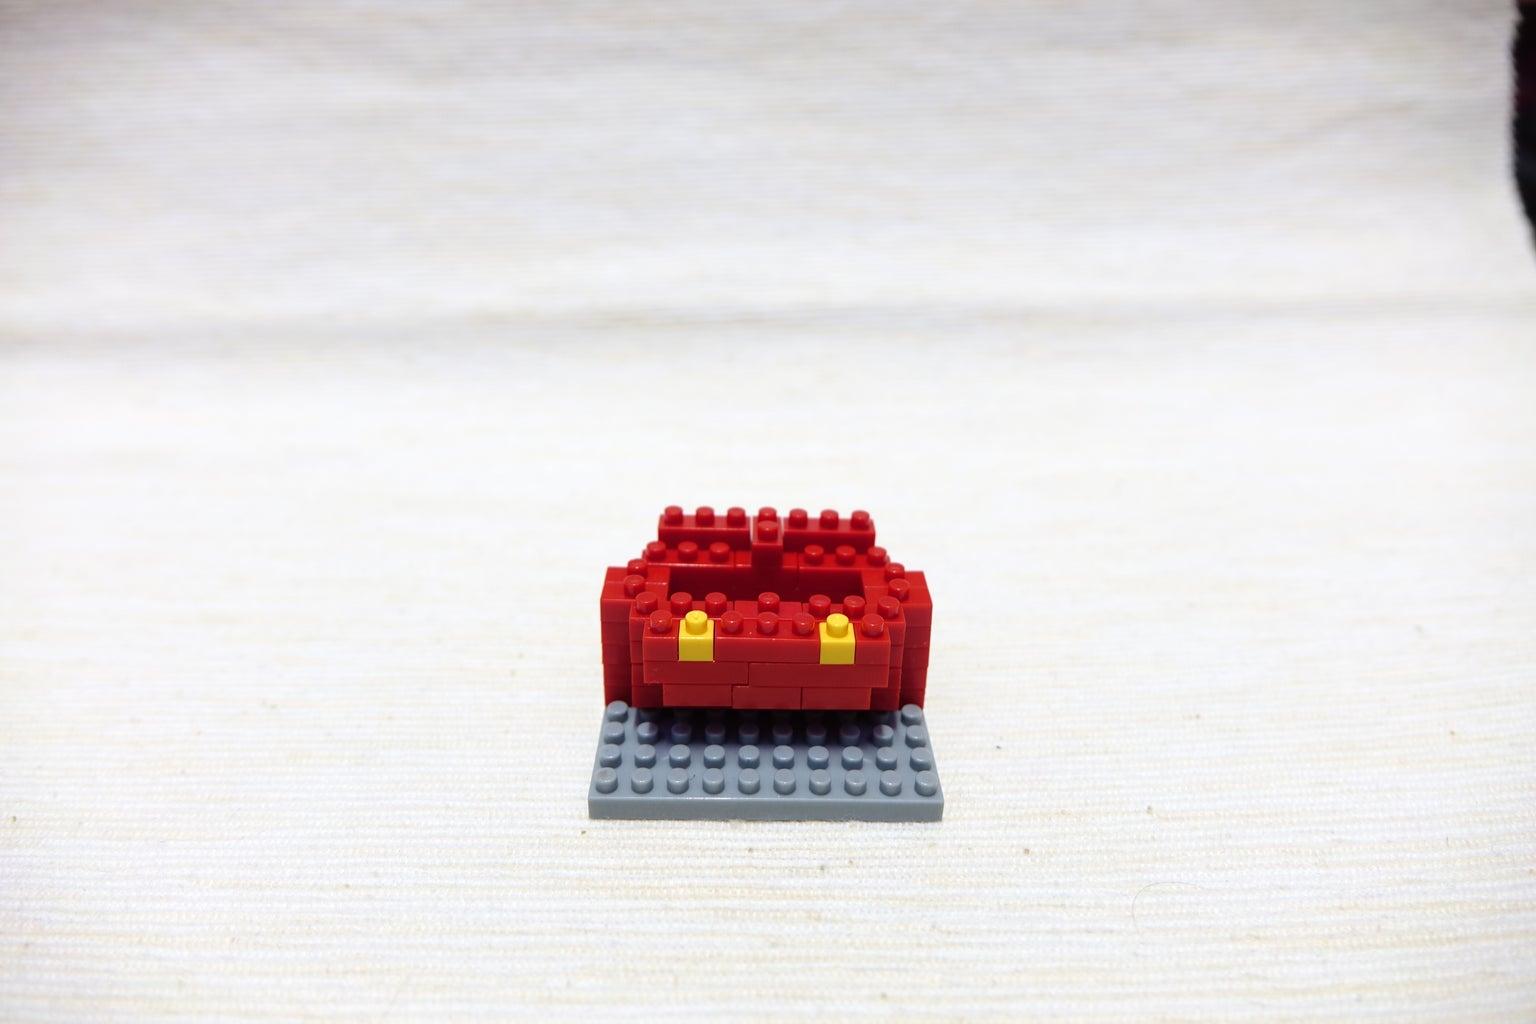 Red Block 1*3, 1*3